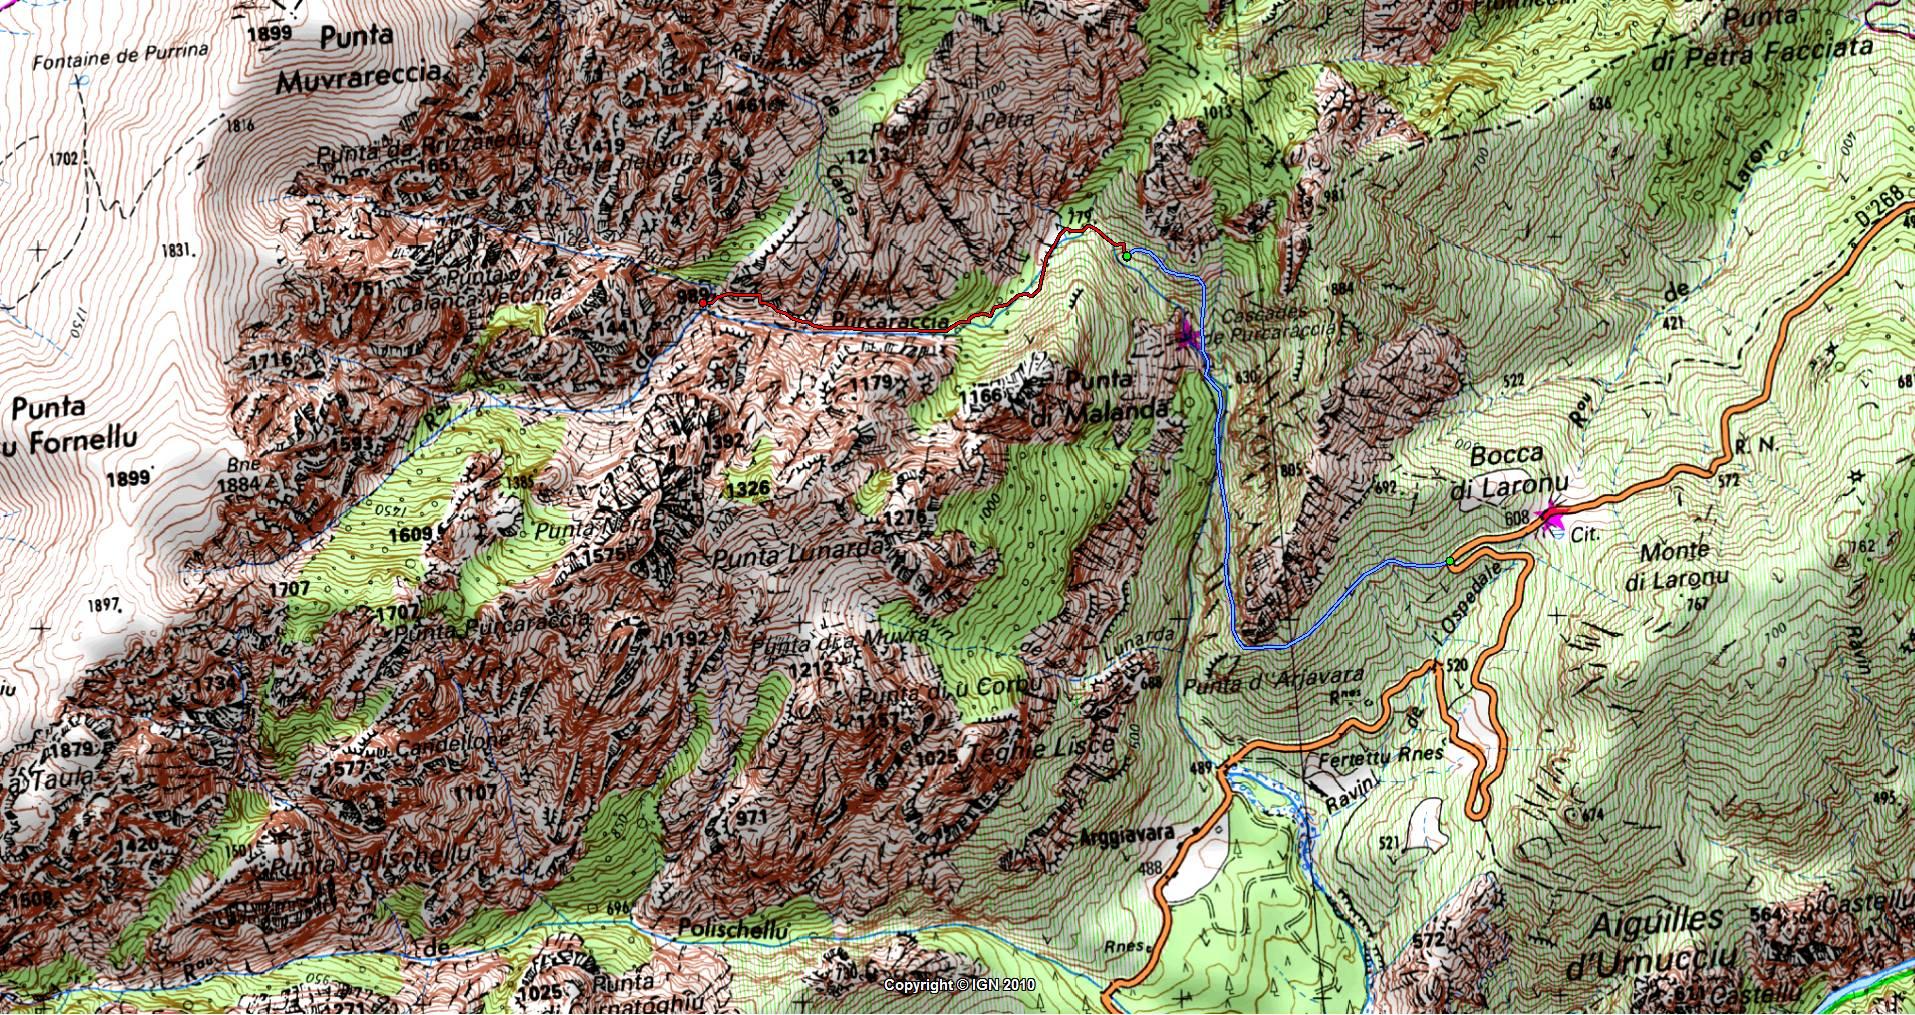 Carte De La Rgion Bavedda Autour Du Ruisseau Purcaraccia Avec En Bleu Le Trac